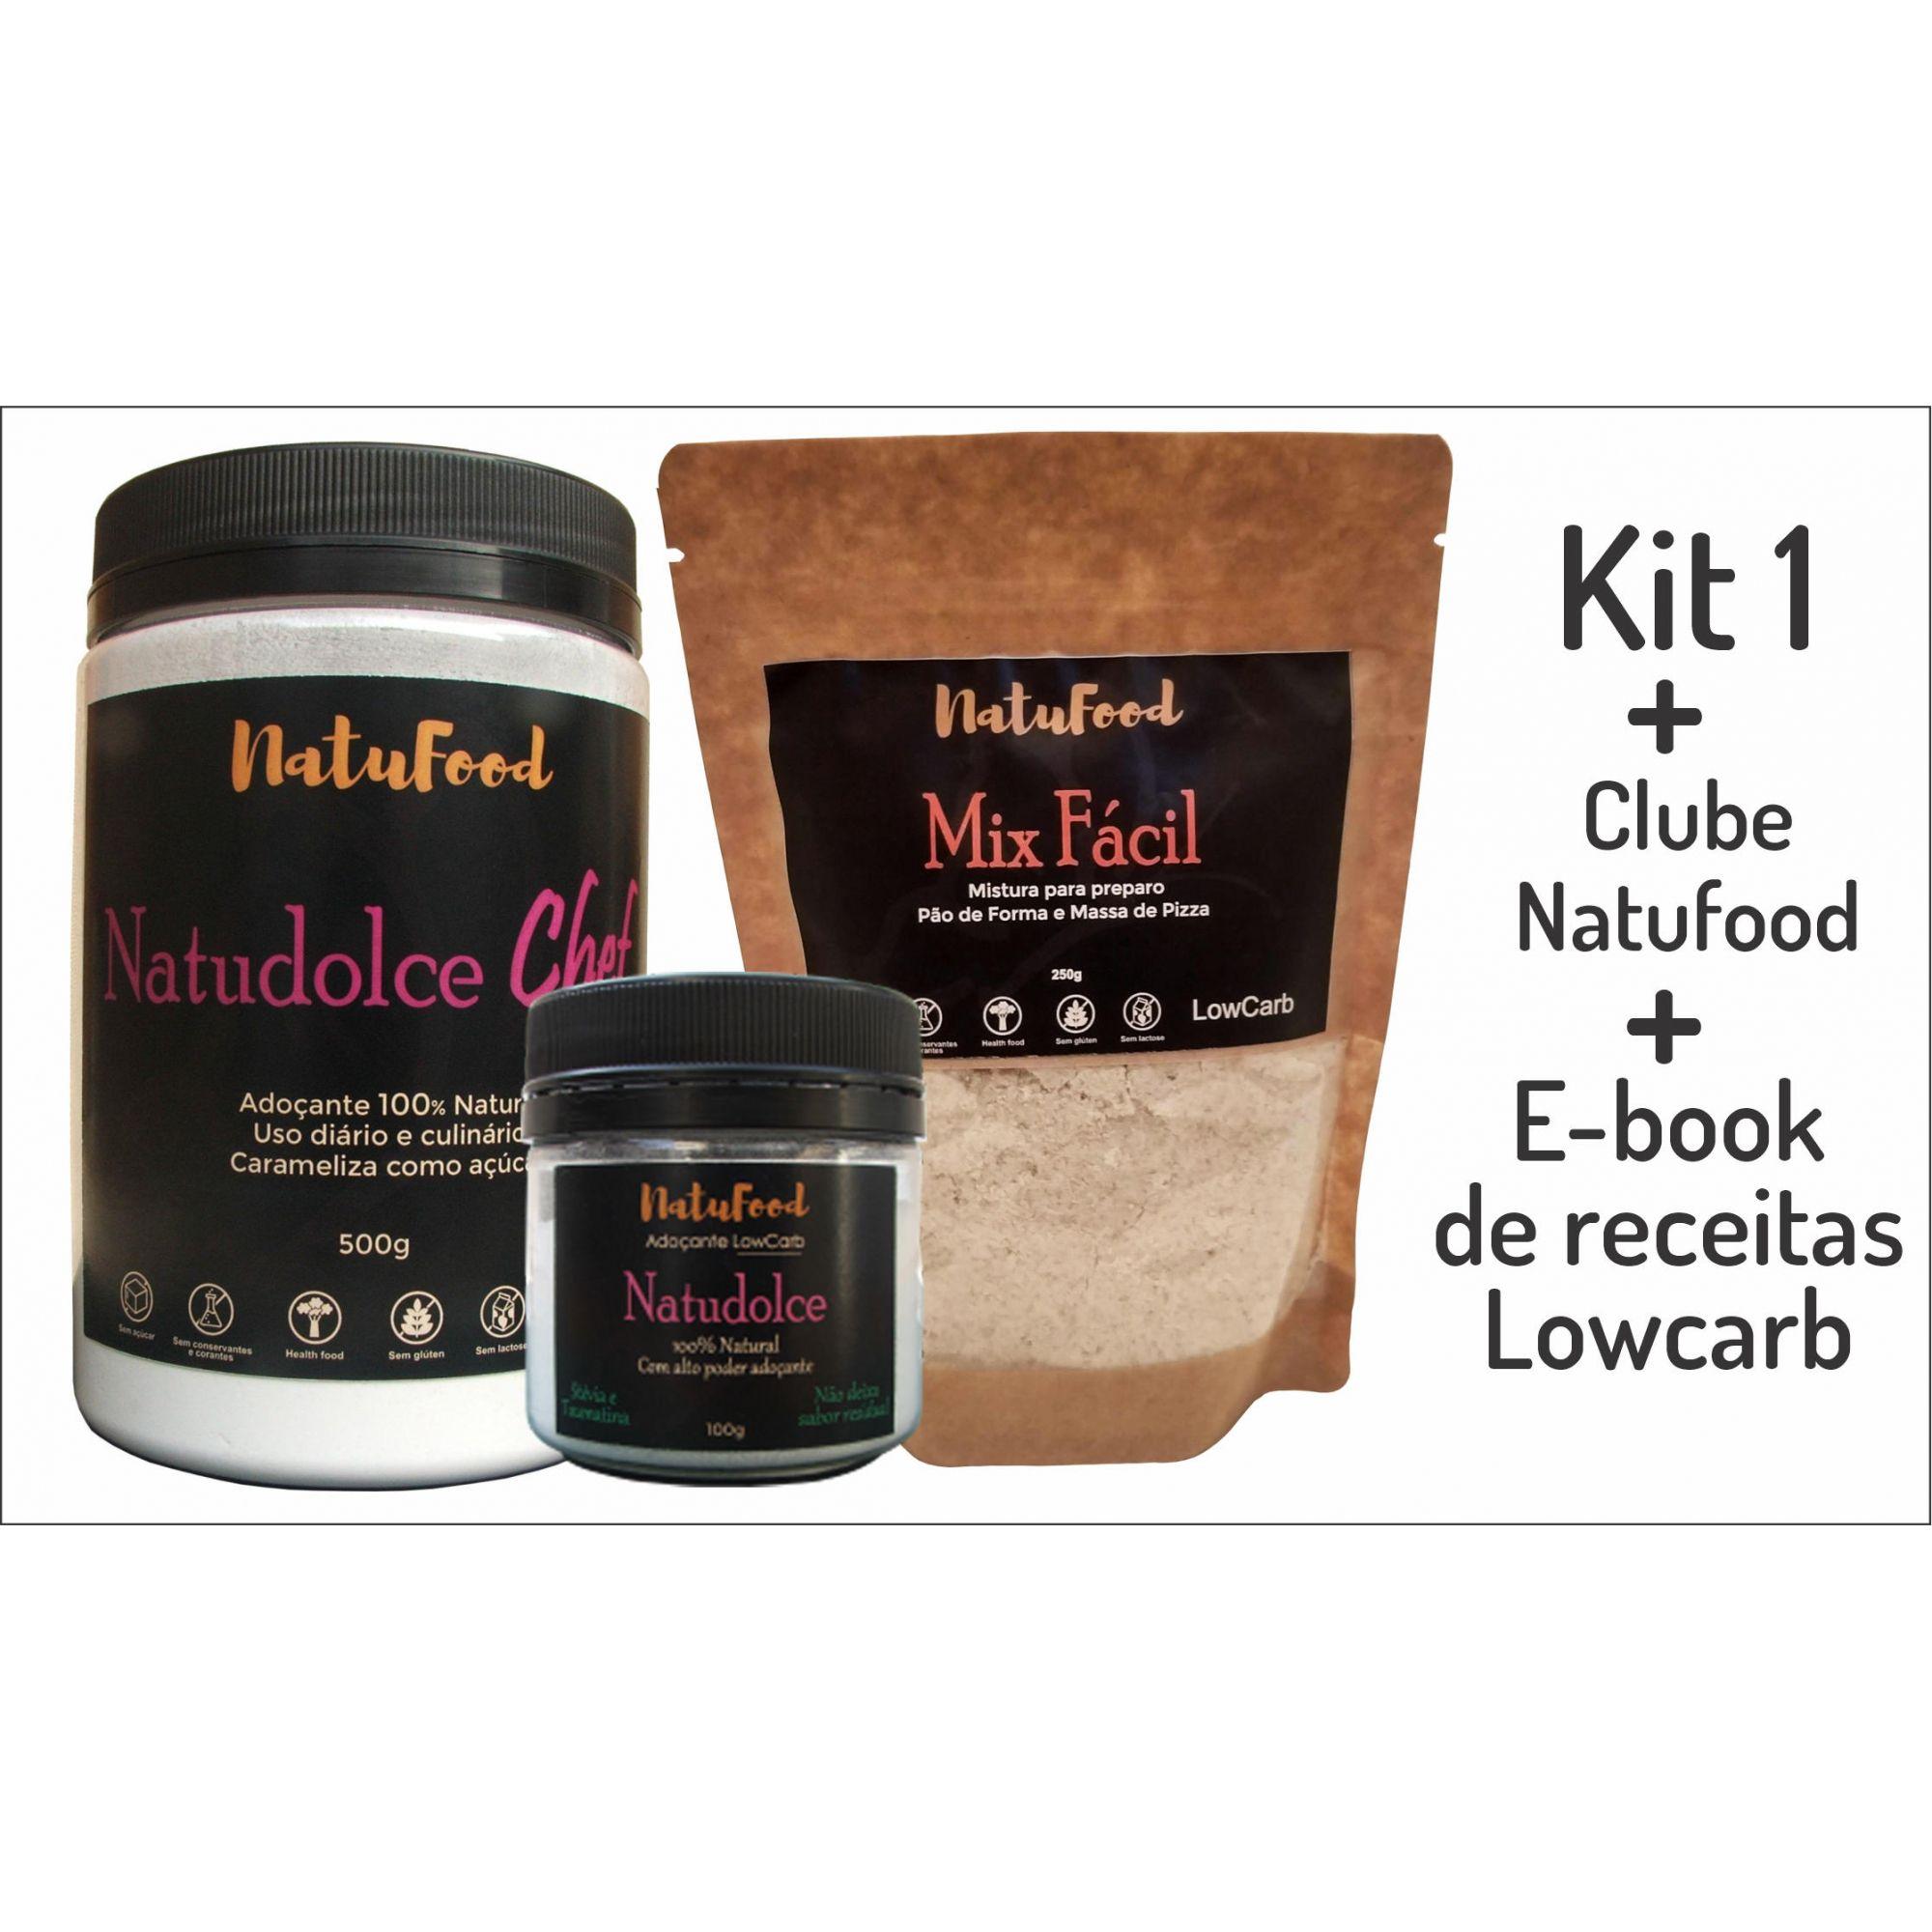 KIT 1 + CLUBE NATUFOOD + E-BOOK  - Natufood